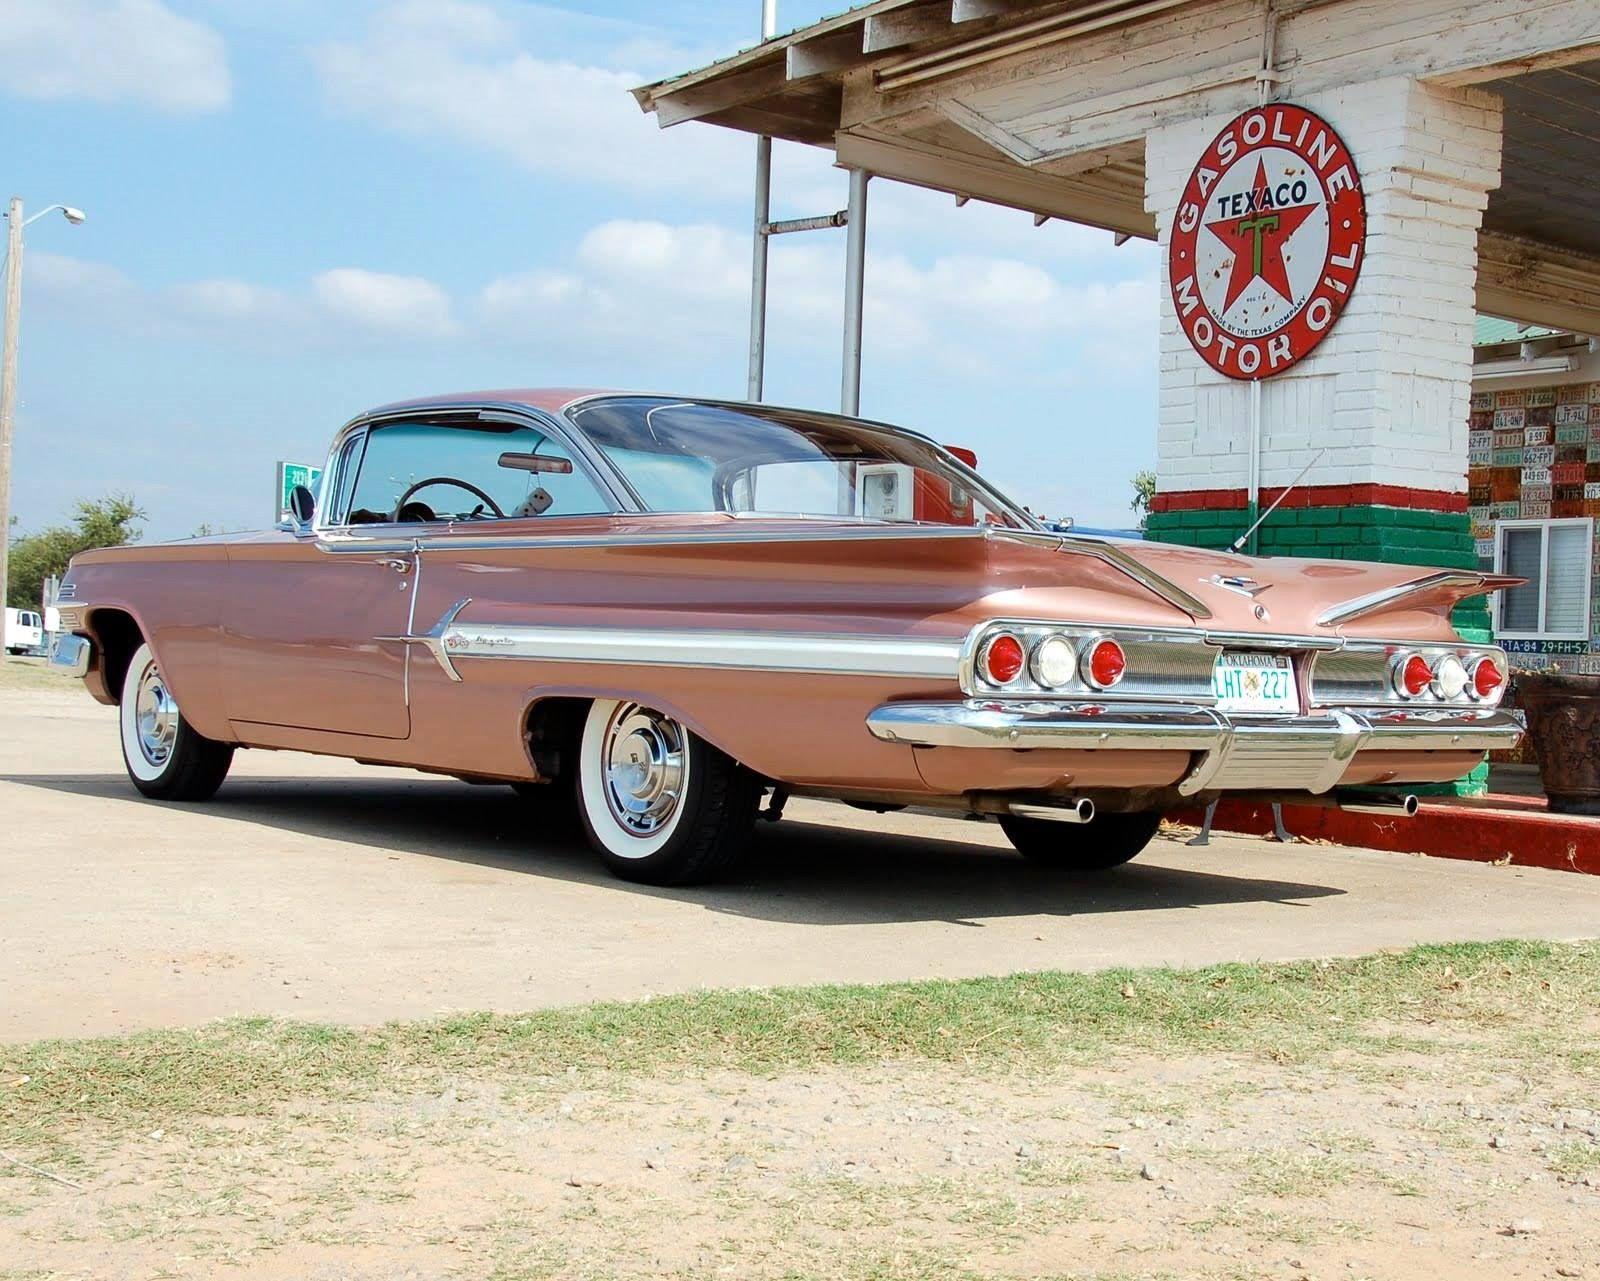 1960 Chevrolet Impala Sport Coupe 1960 Chevy Impala Chevy Impala Classic Cars Chevy